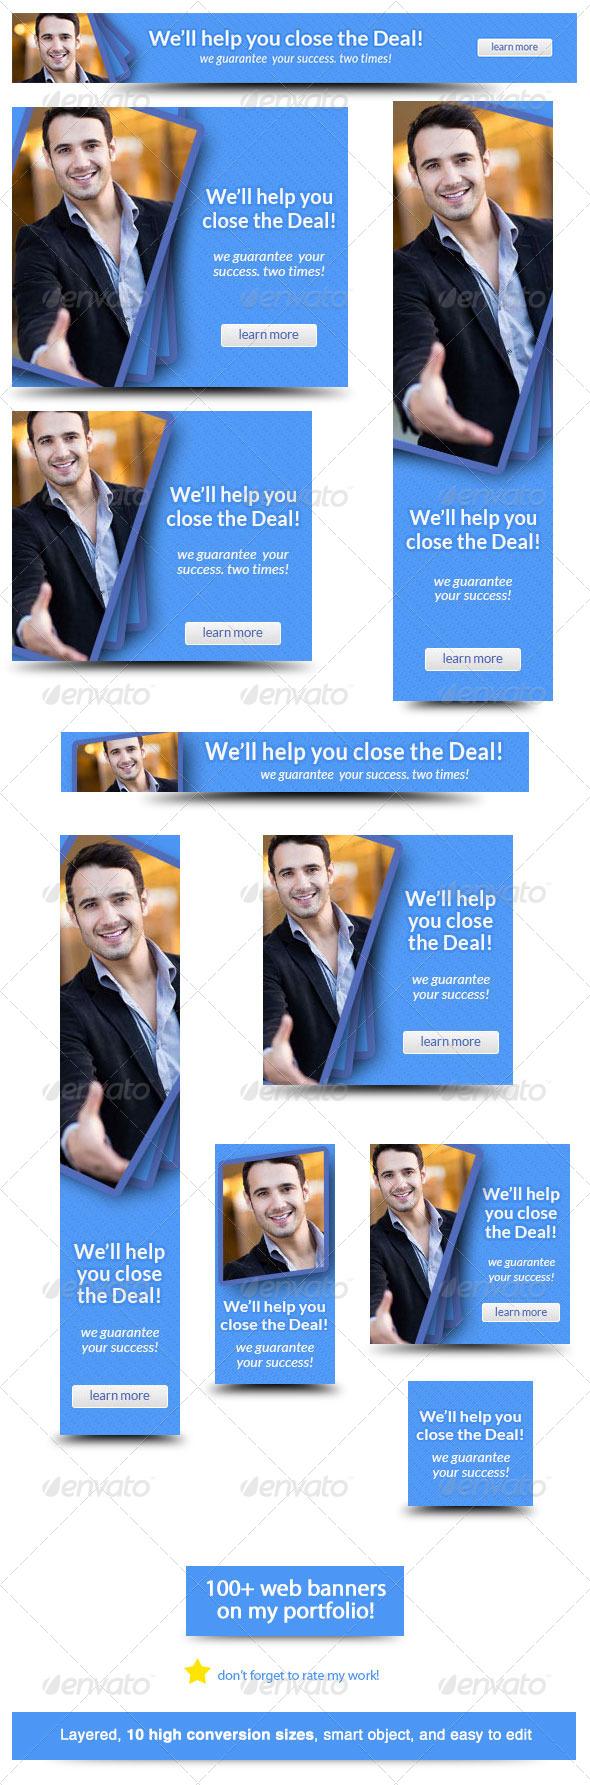 corporate web banner design template 27admiral_adictus